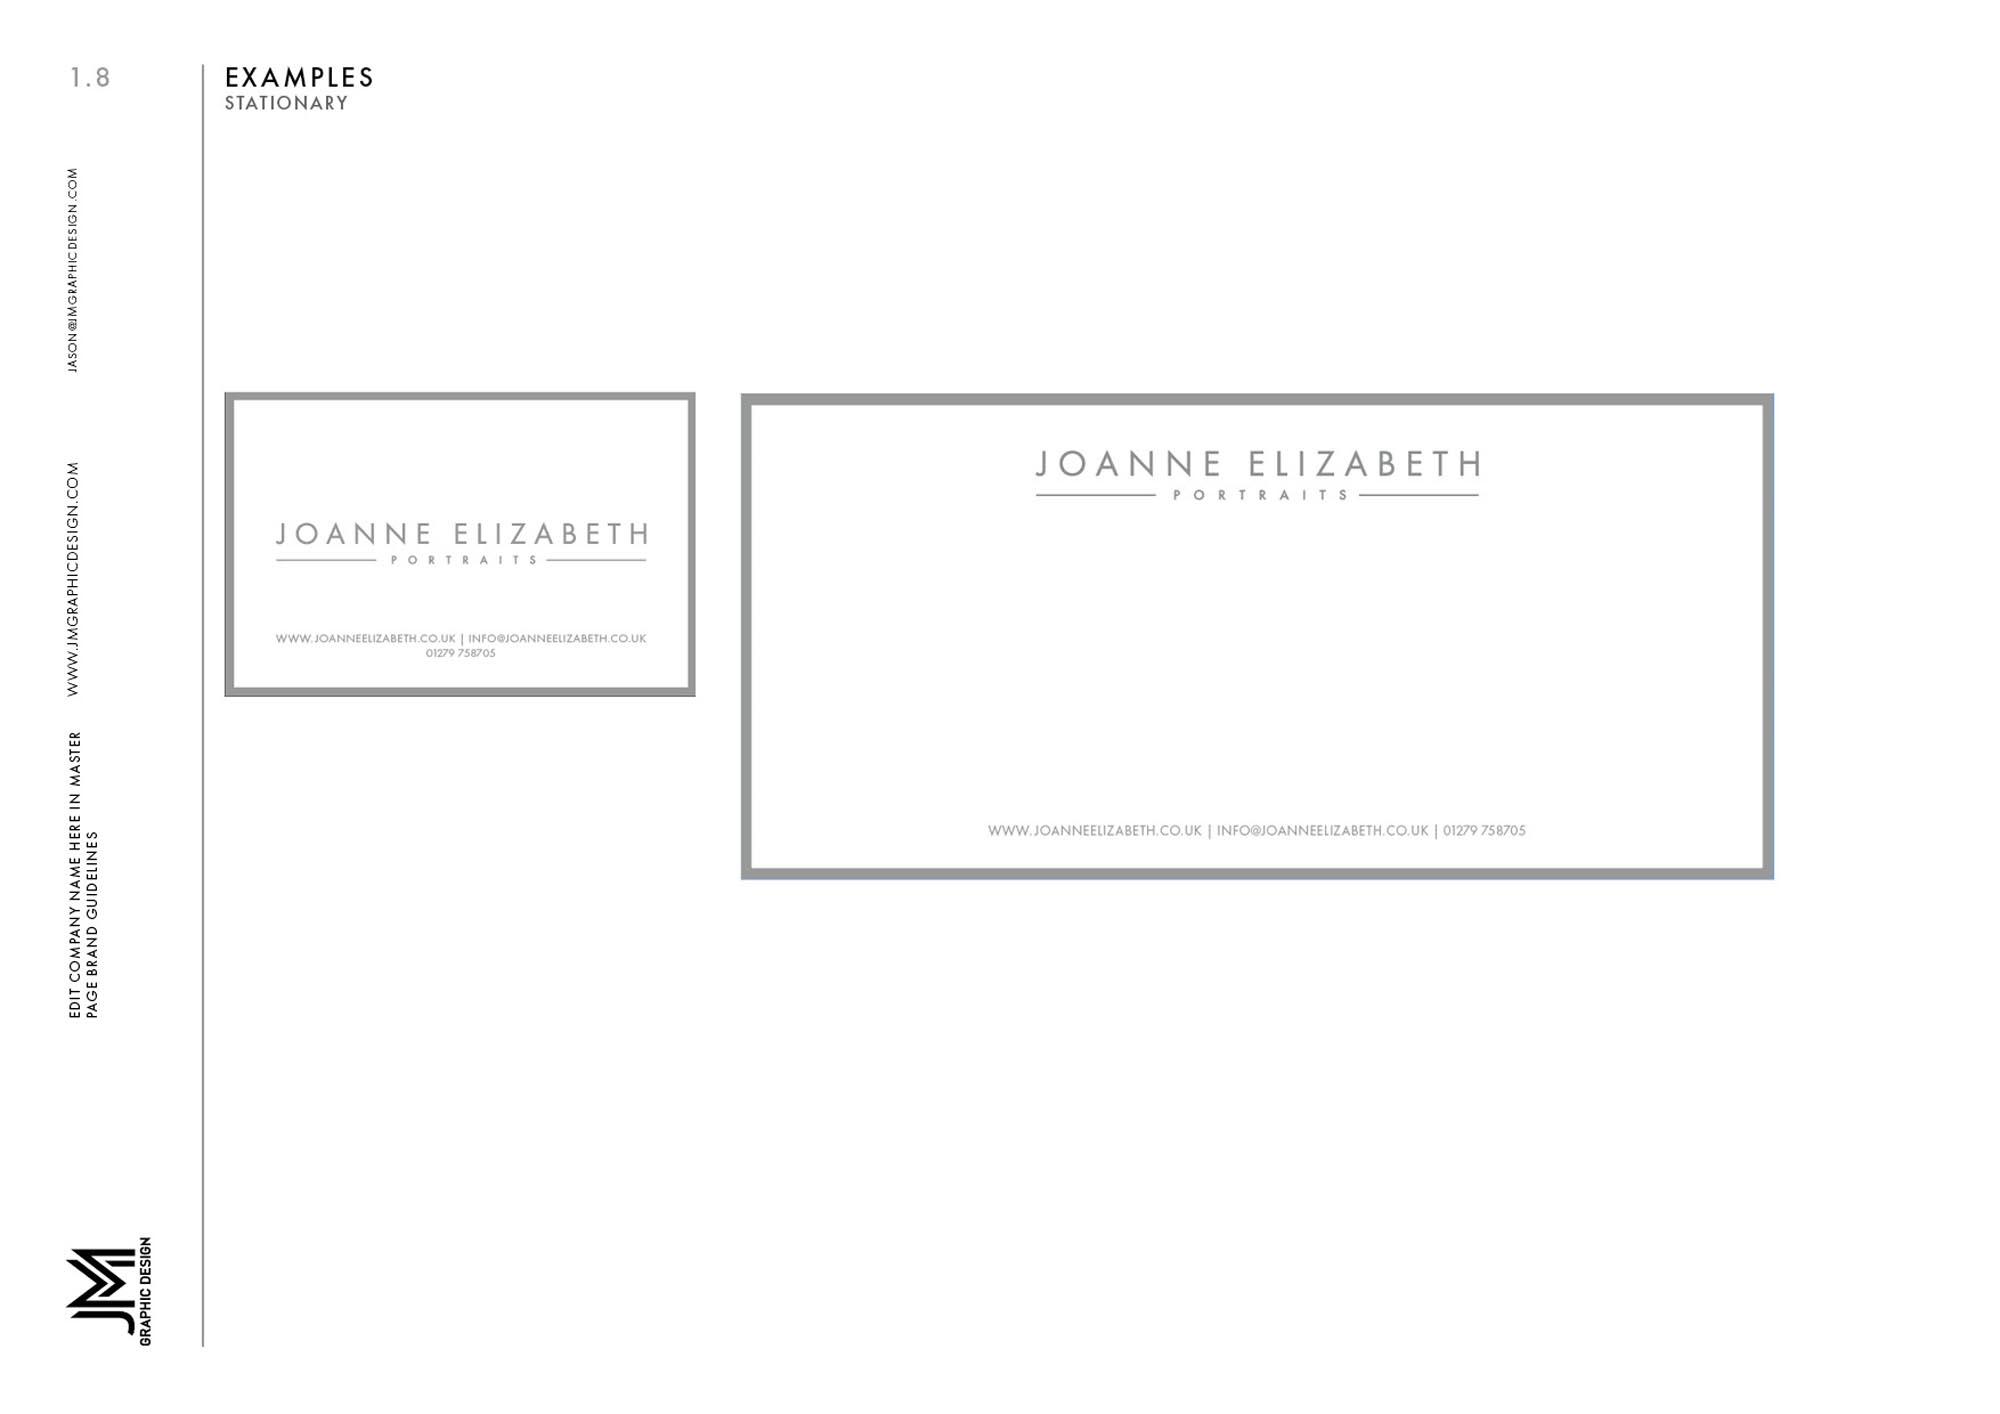 Joanne Elizabeth Photography - Brand Guidelines8